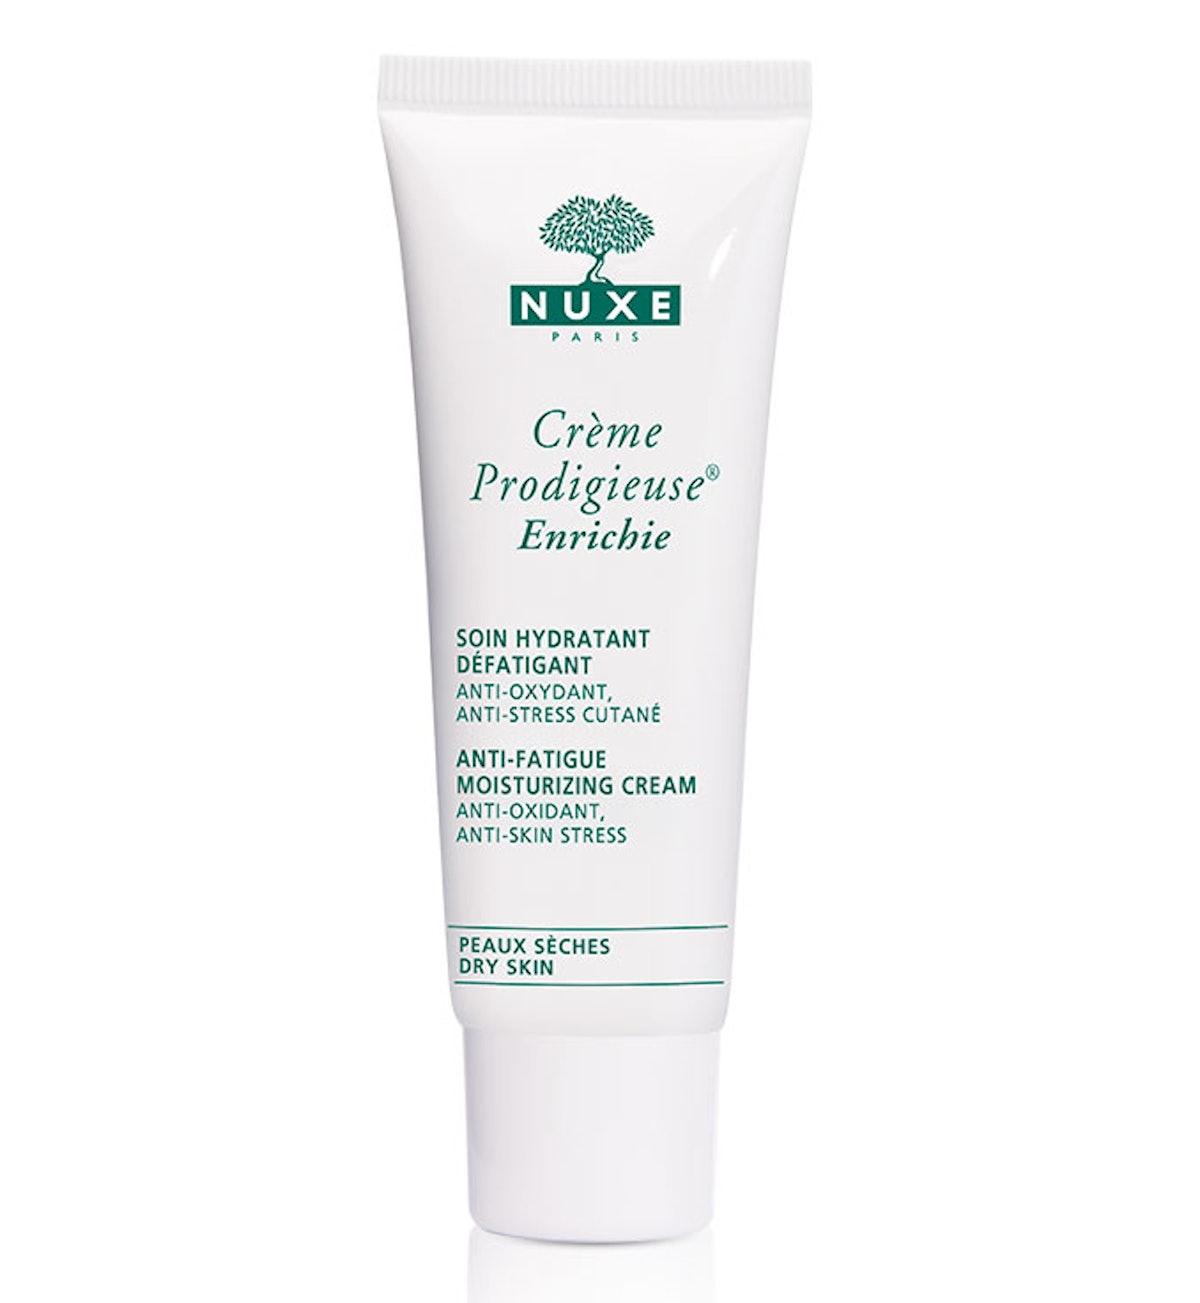 Nuxe Moisturizing Cream Crème Prodigieuse Enrichie